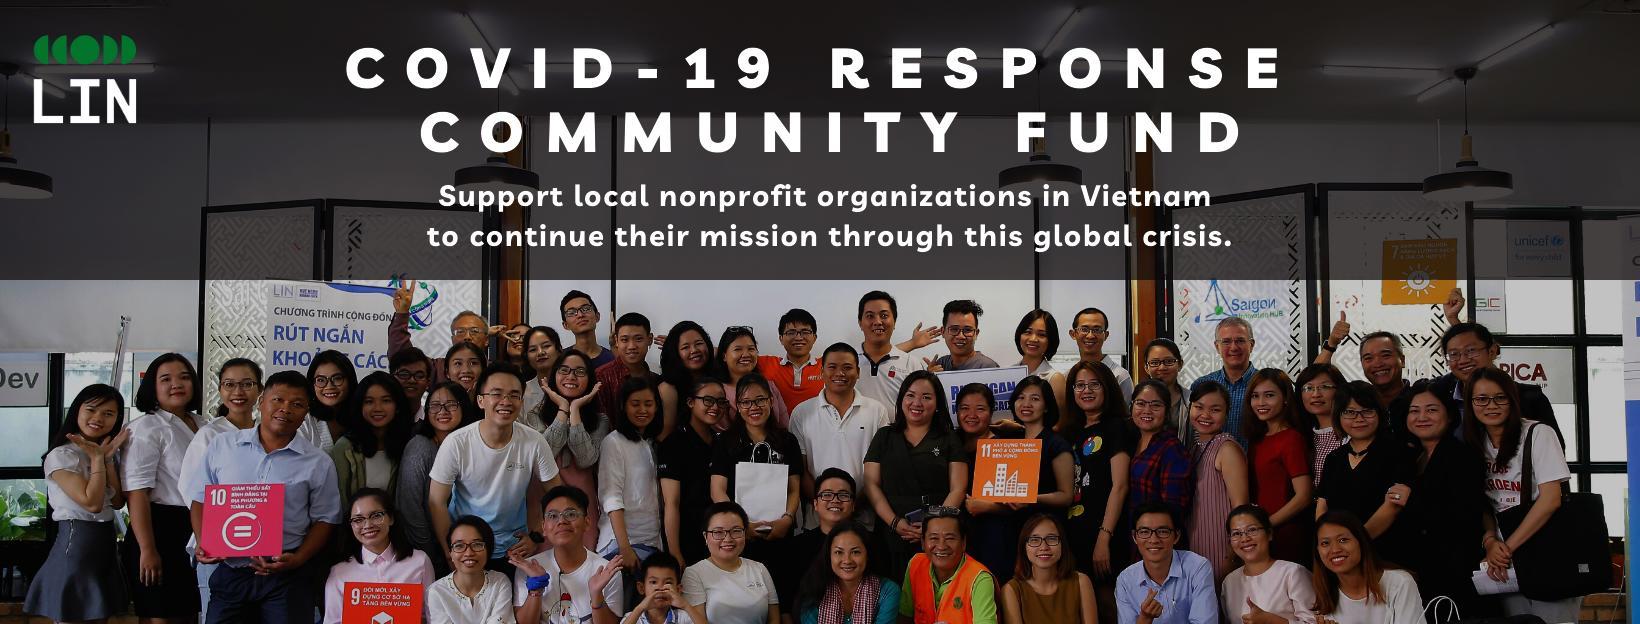 LIN's Covid-19 Response Community Fund